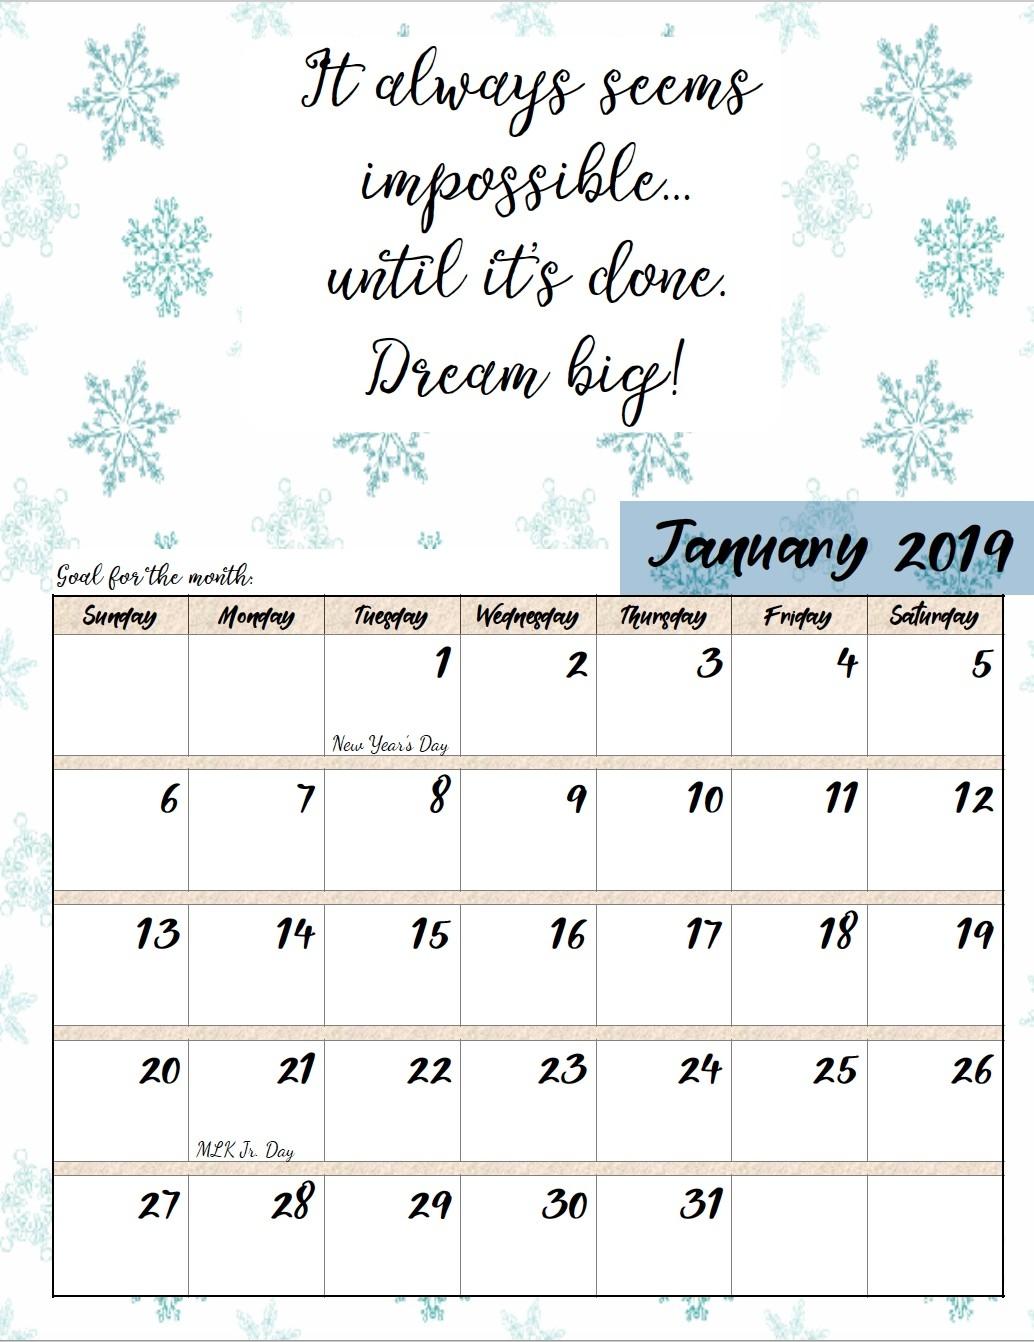 December 2019 January 2020 Calendar Printable | Calendar-January 2020 Calendar Kannada